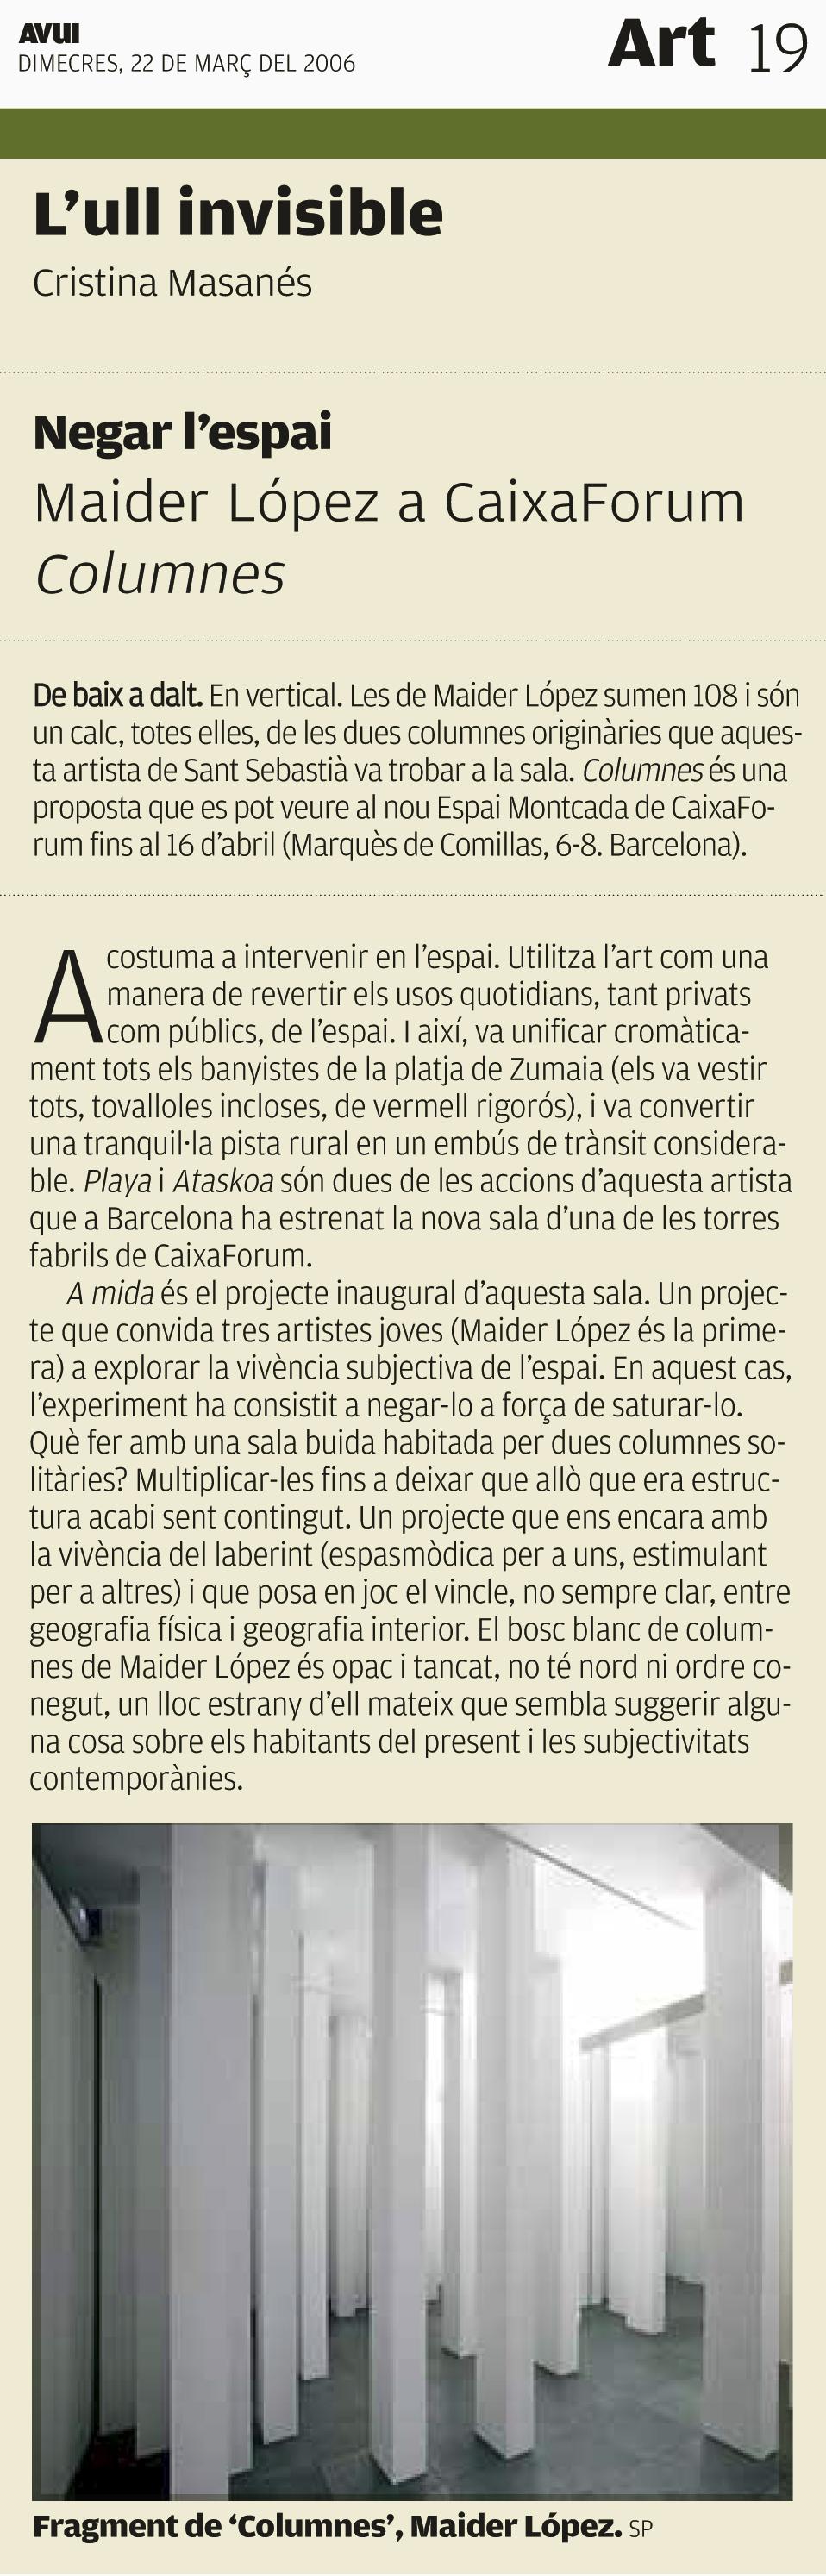 PREM_AVUI_ULL_NEGARL'ESPAI_MaiderLópez.jpg